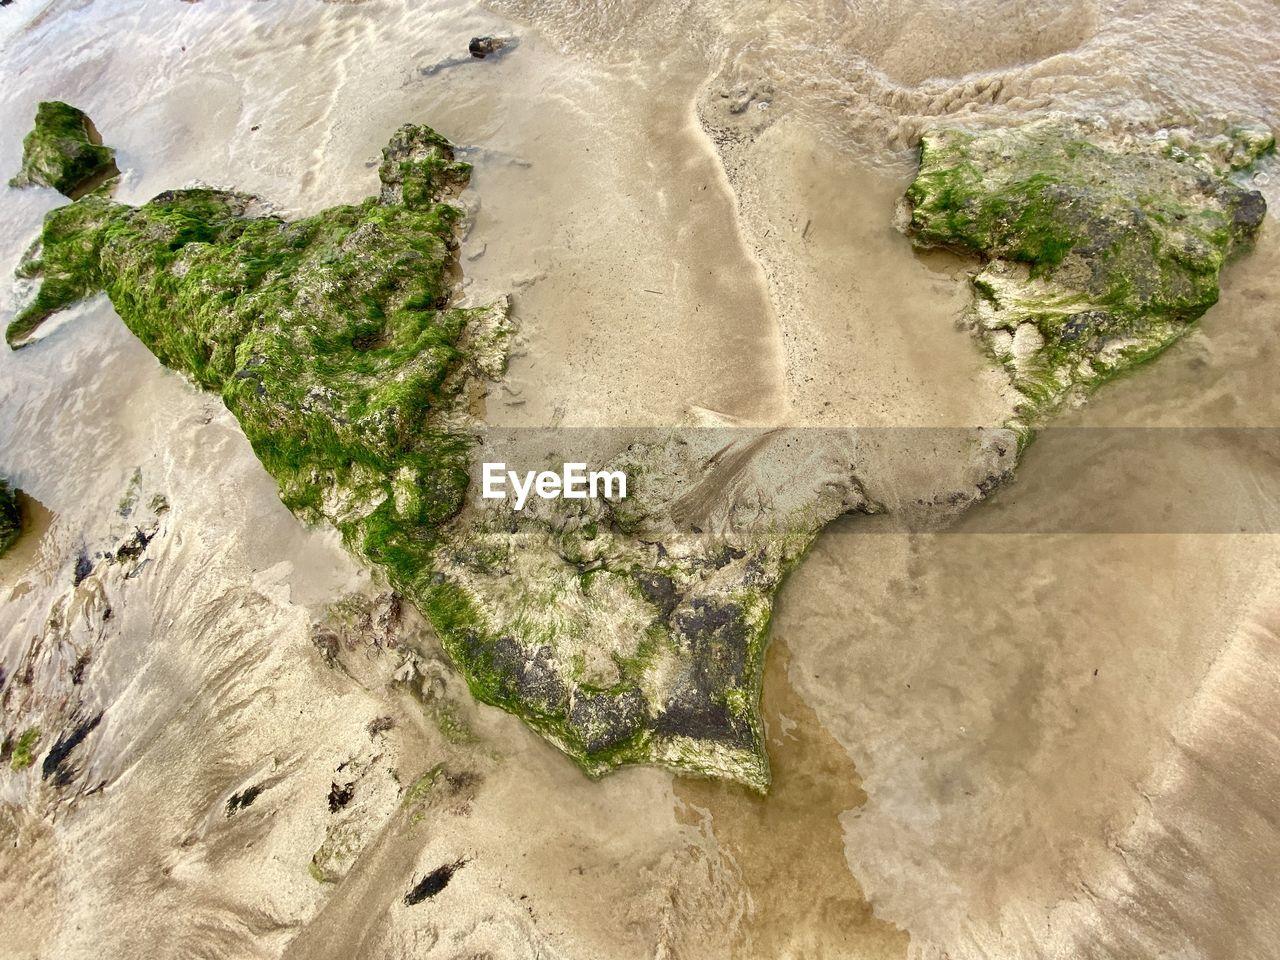 Rocks with algae - high angle view of beach